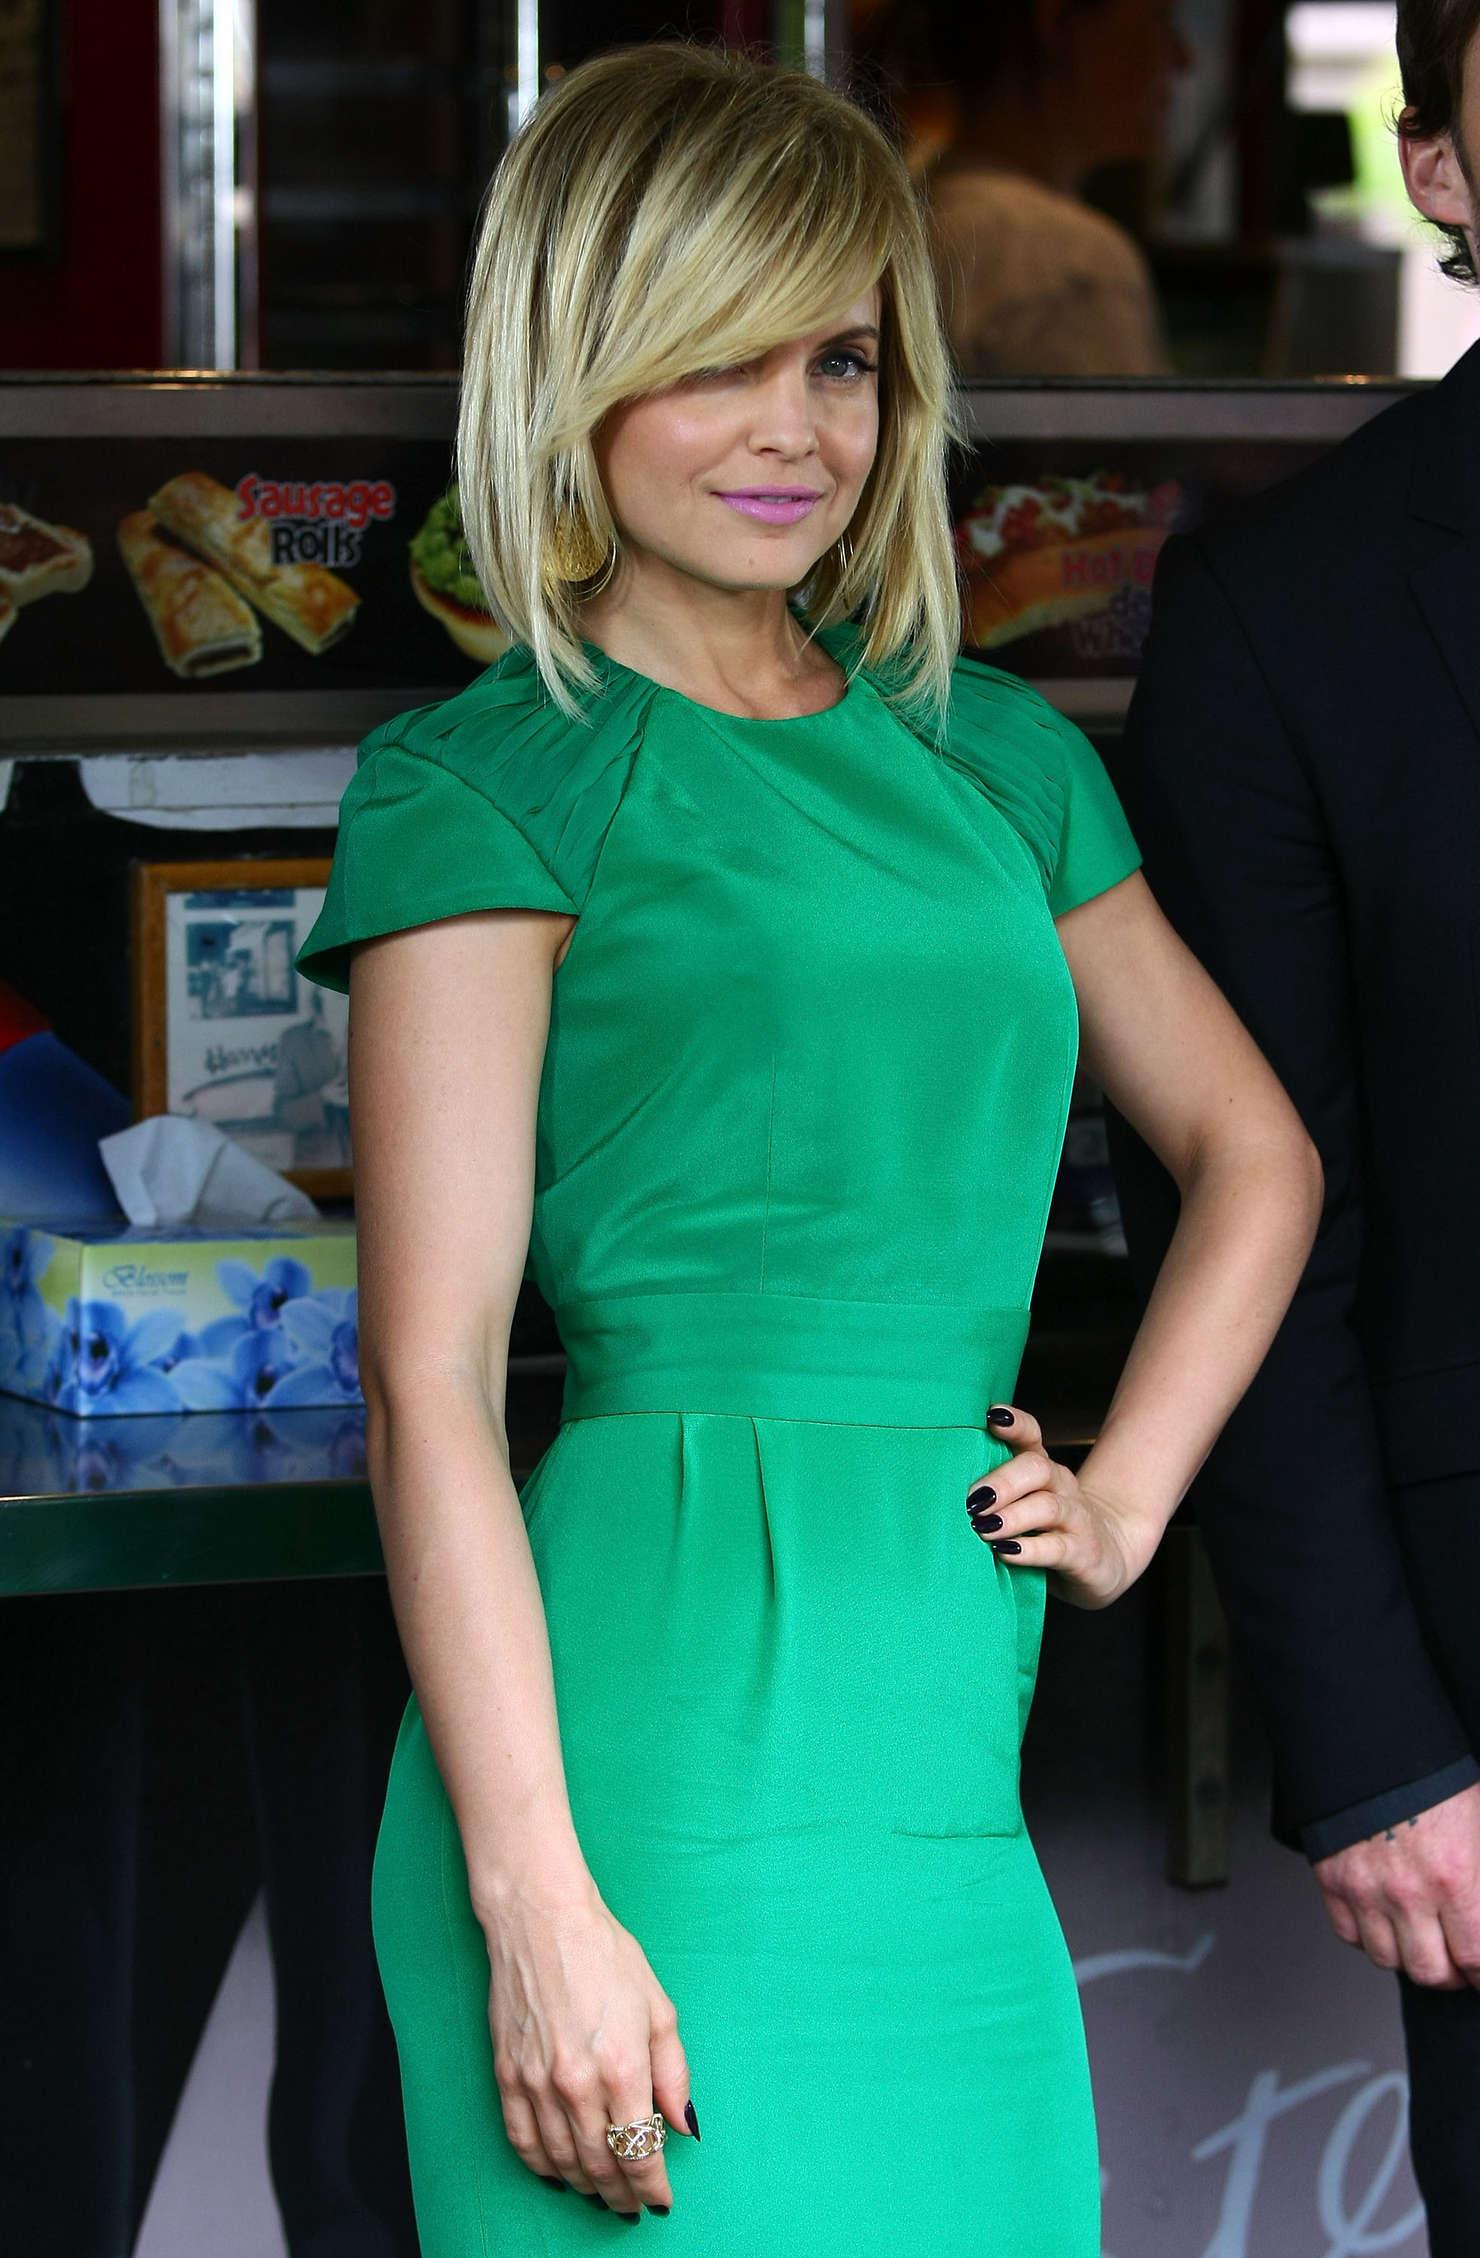 Mena Suvari Wear Hot Short Dress At American Pie Reunion